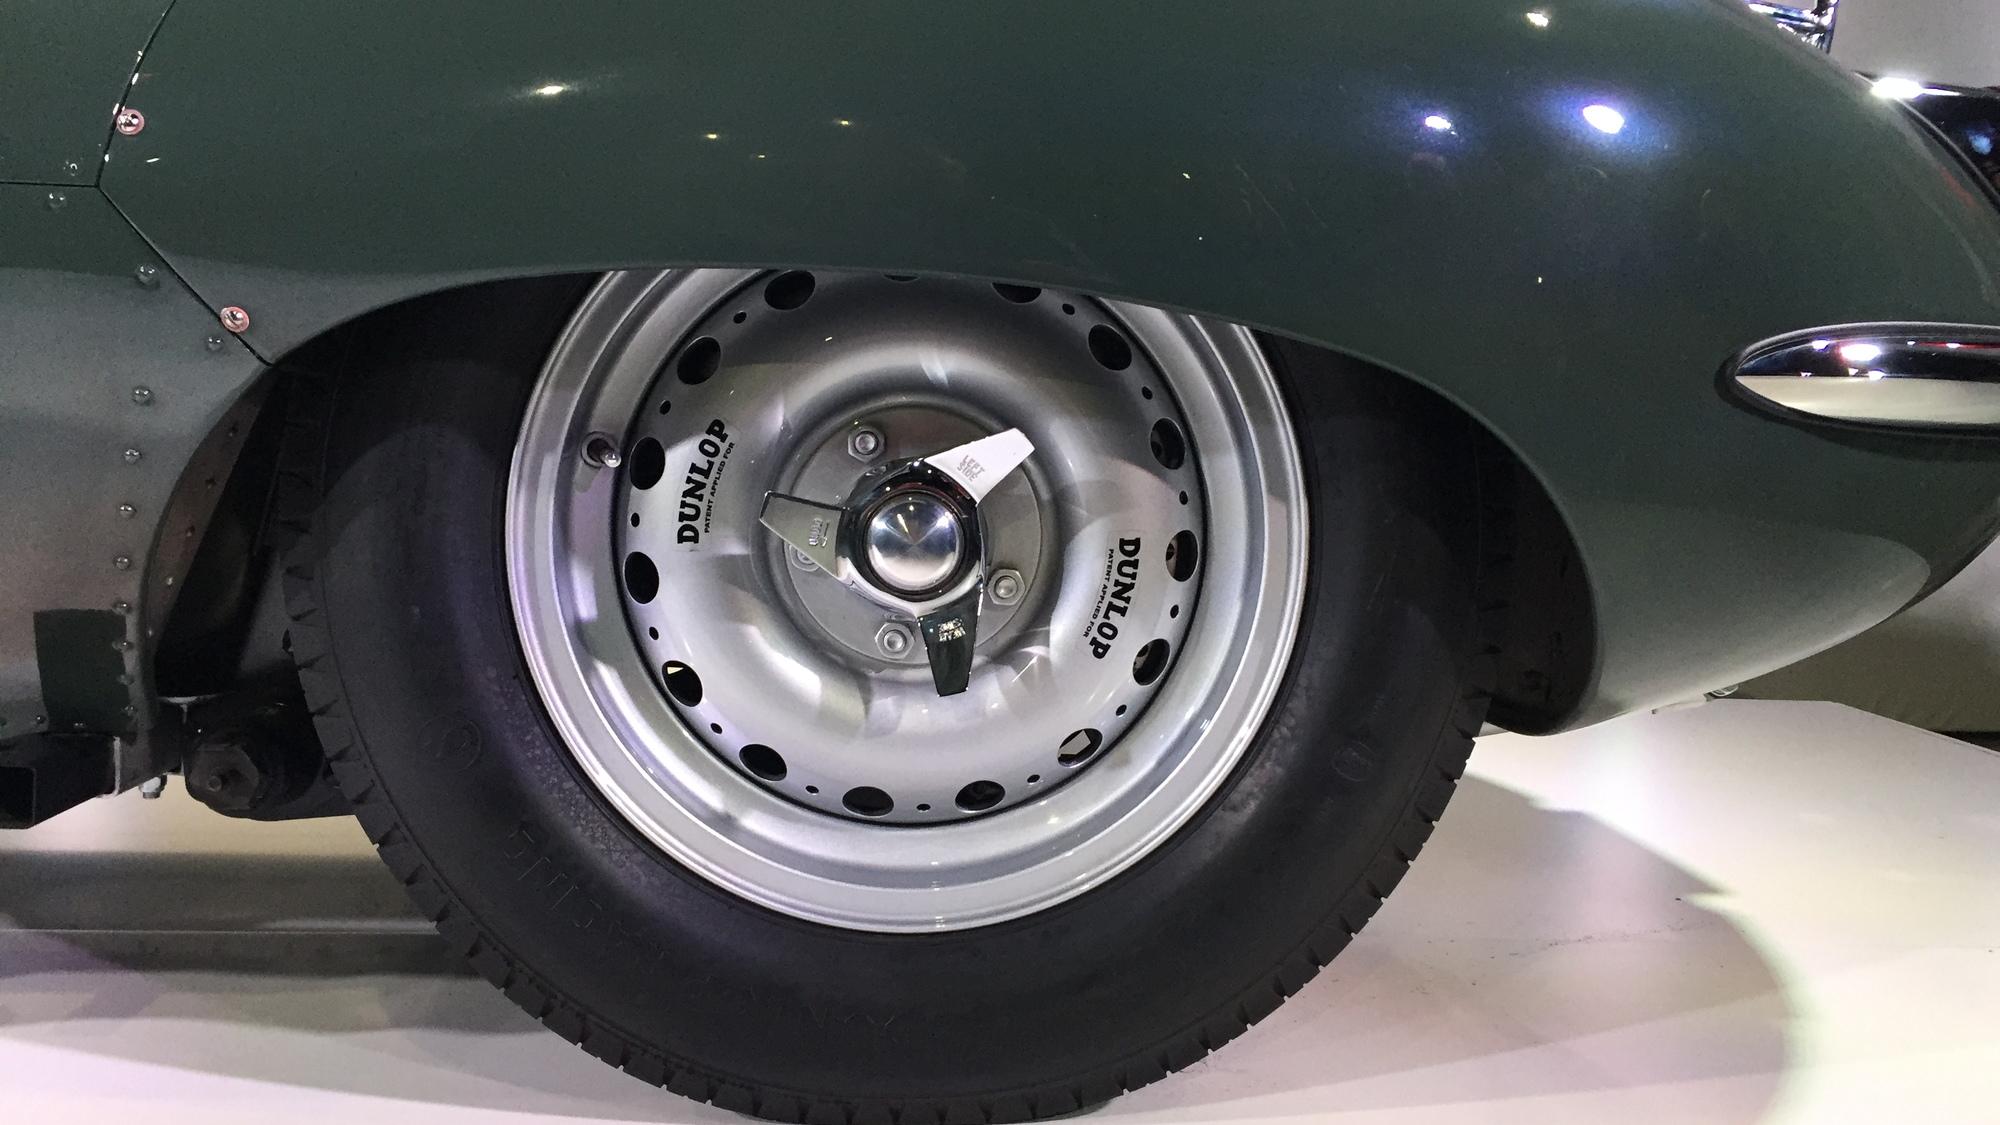 1957 Jaguar XKSS continuation model